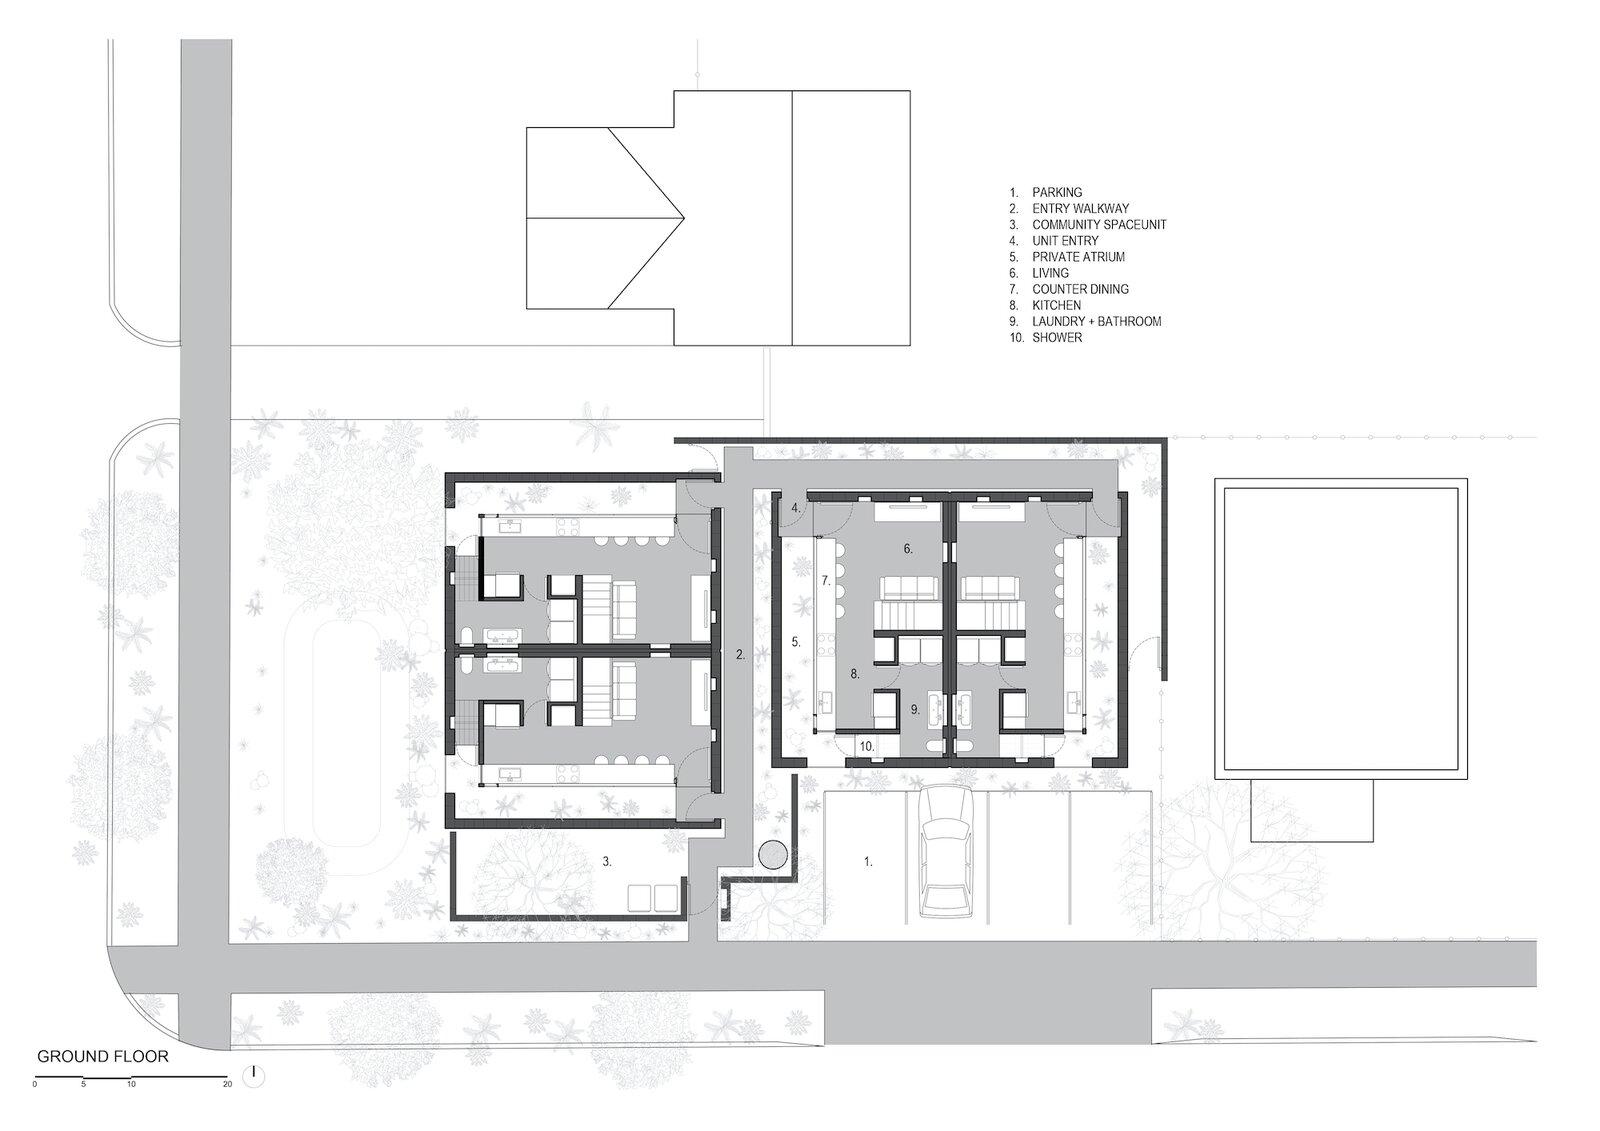 Ground floor plan of White Stone Flats by Benjamin Hall Design.